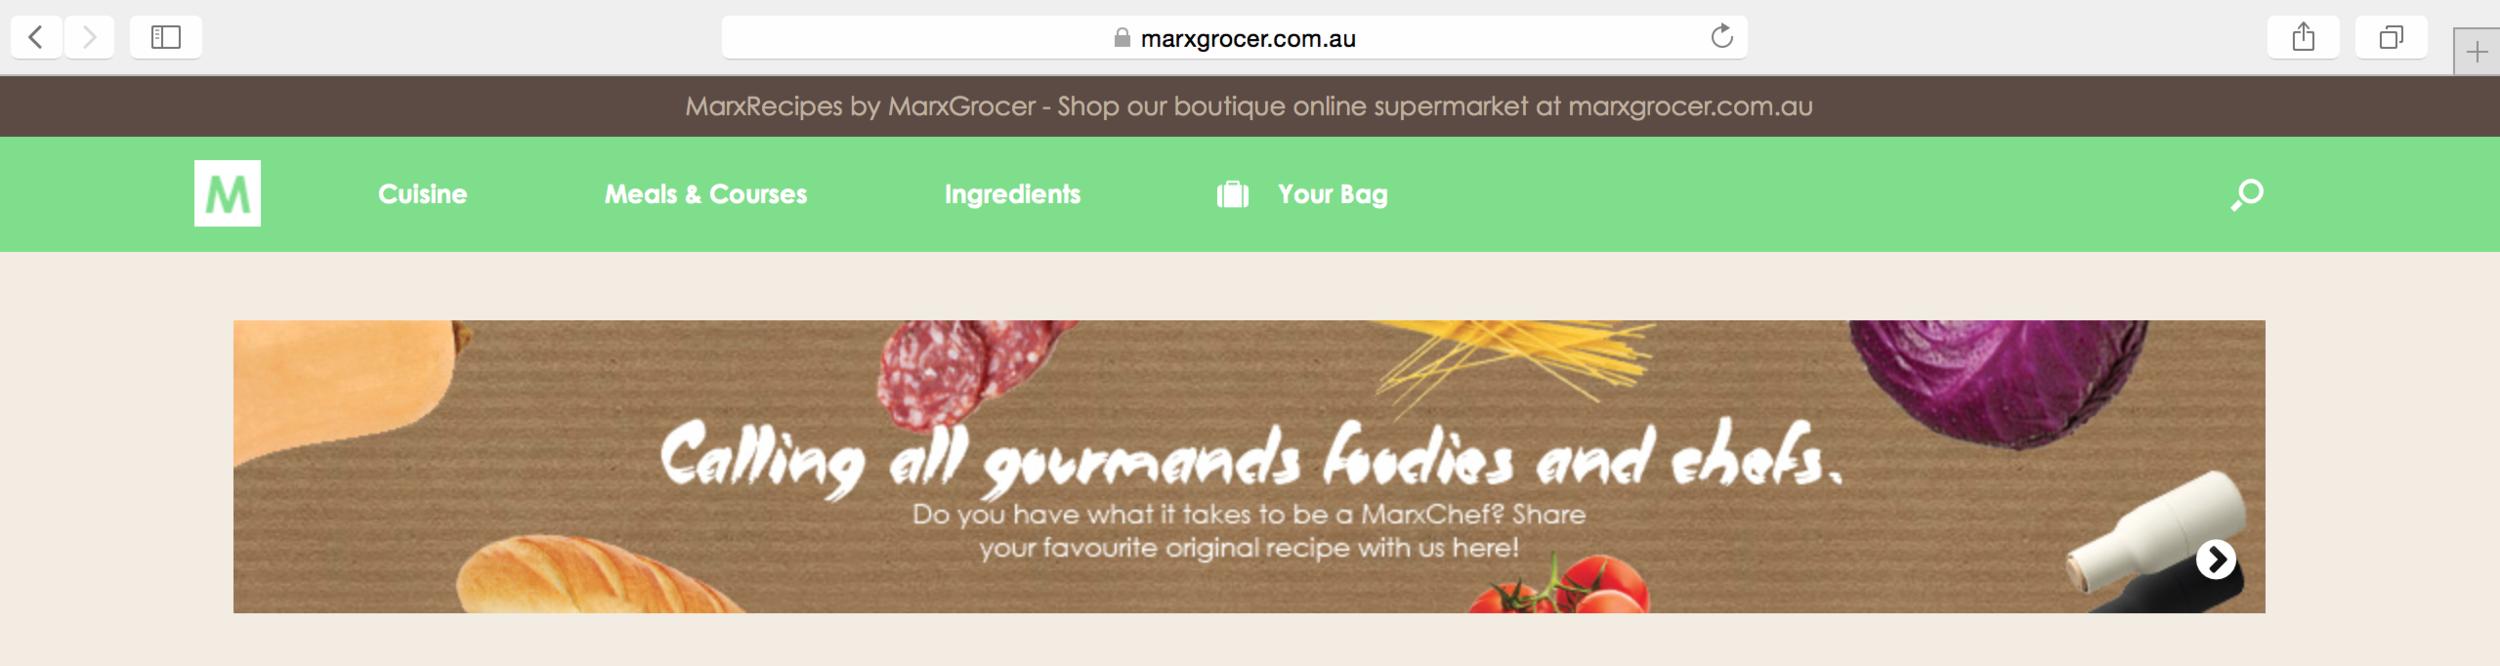 marxgrocer_marxrecipes_cta.png